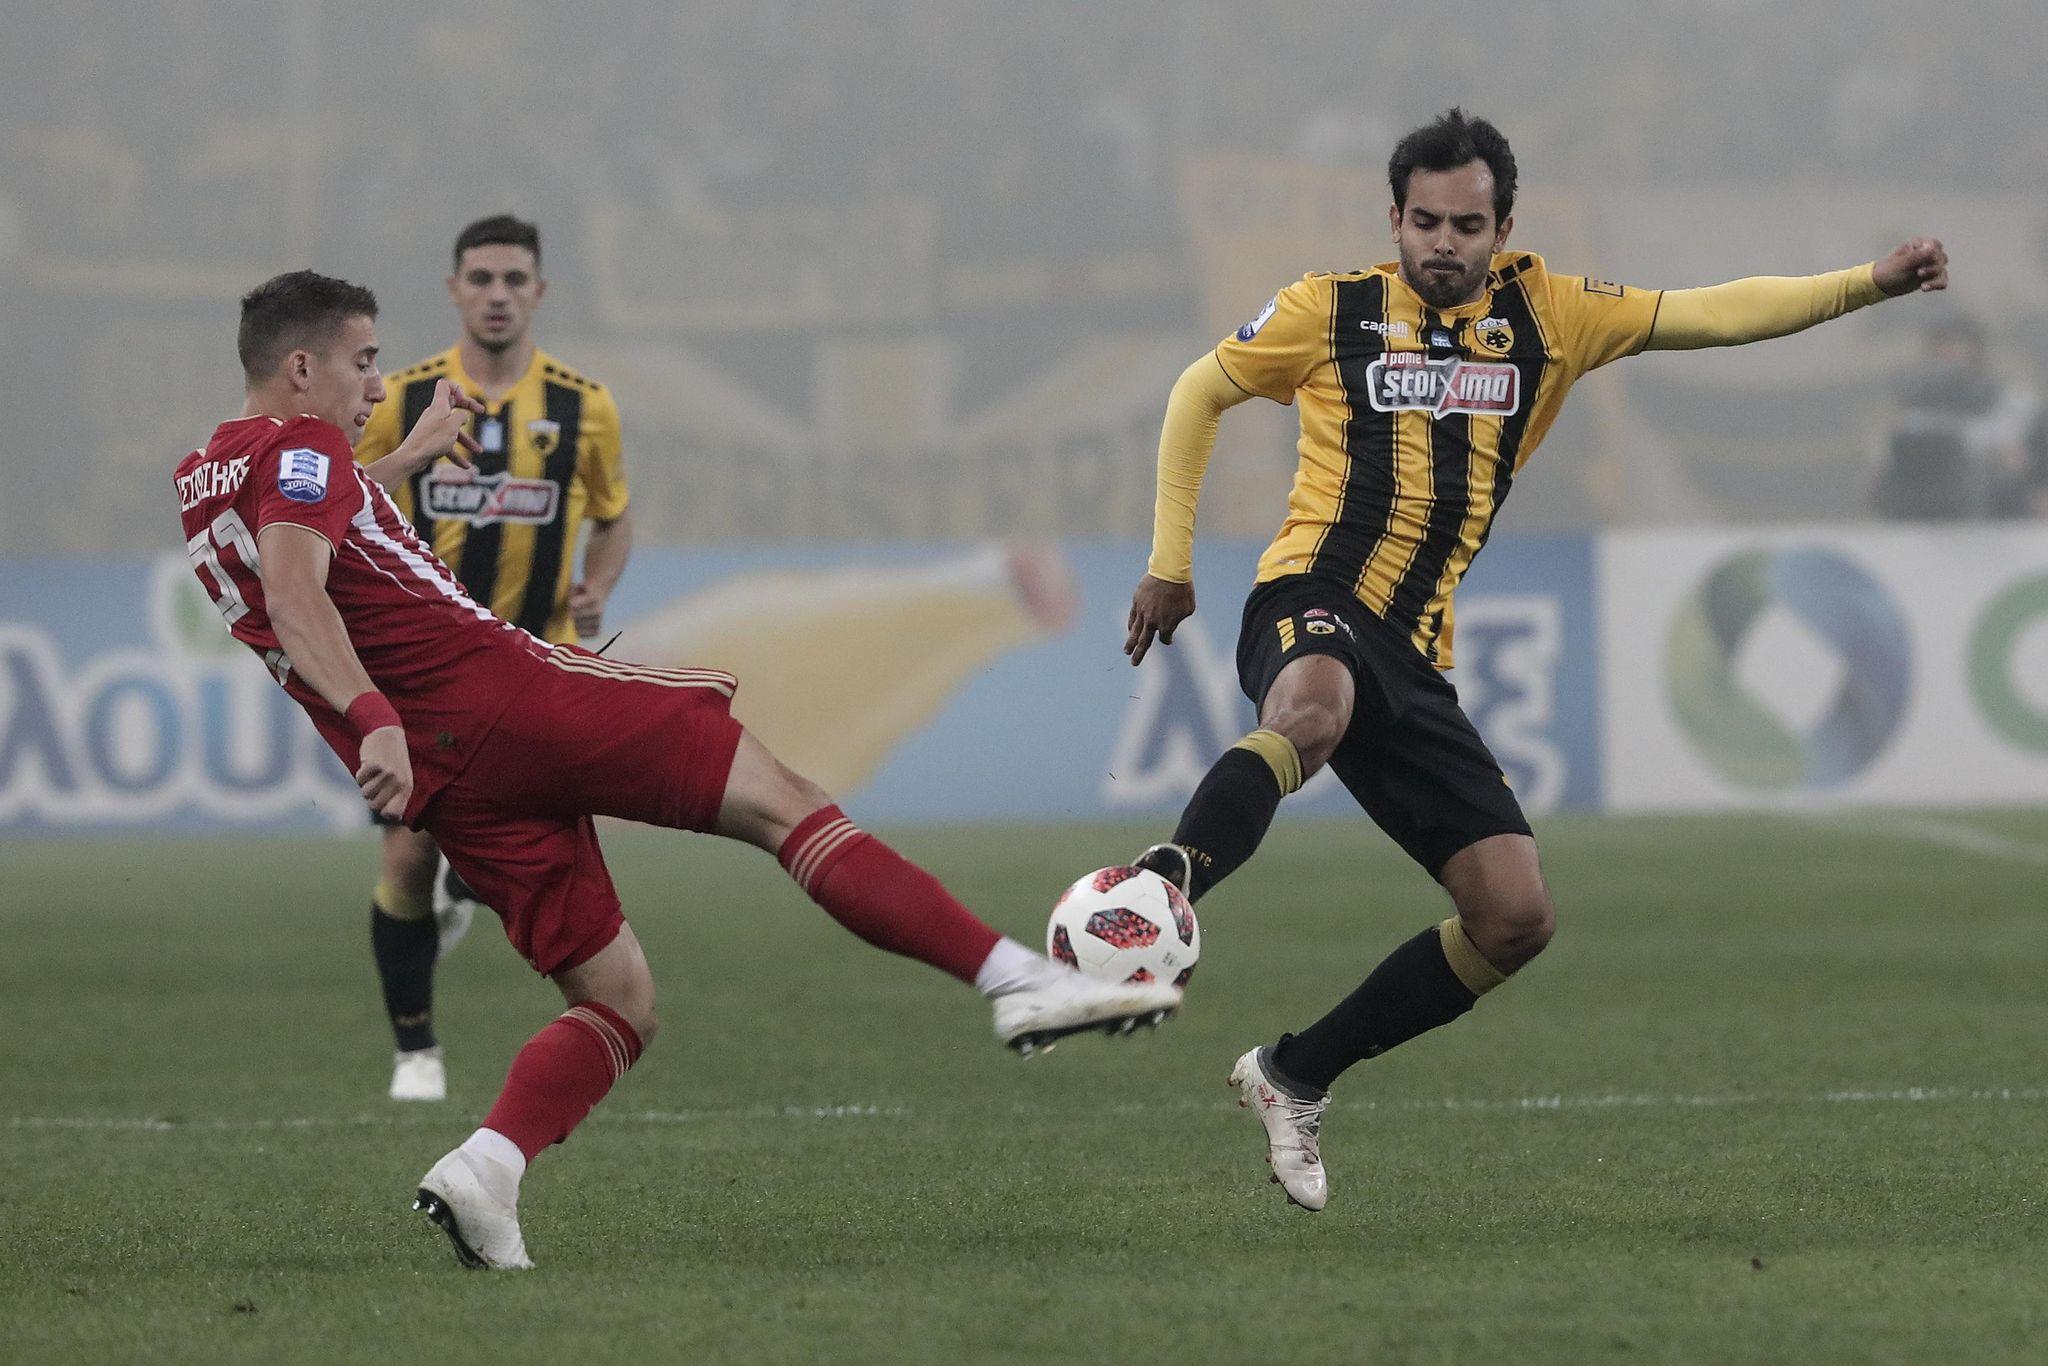 Greek champion AEK Athens to lose points for fan violence - Washington Times